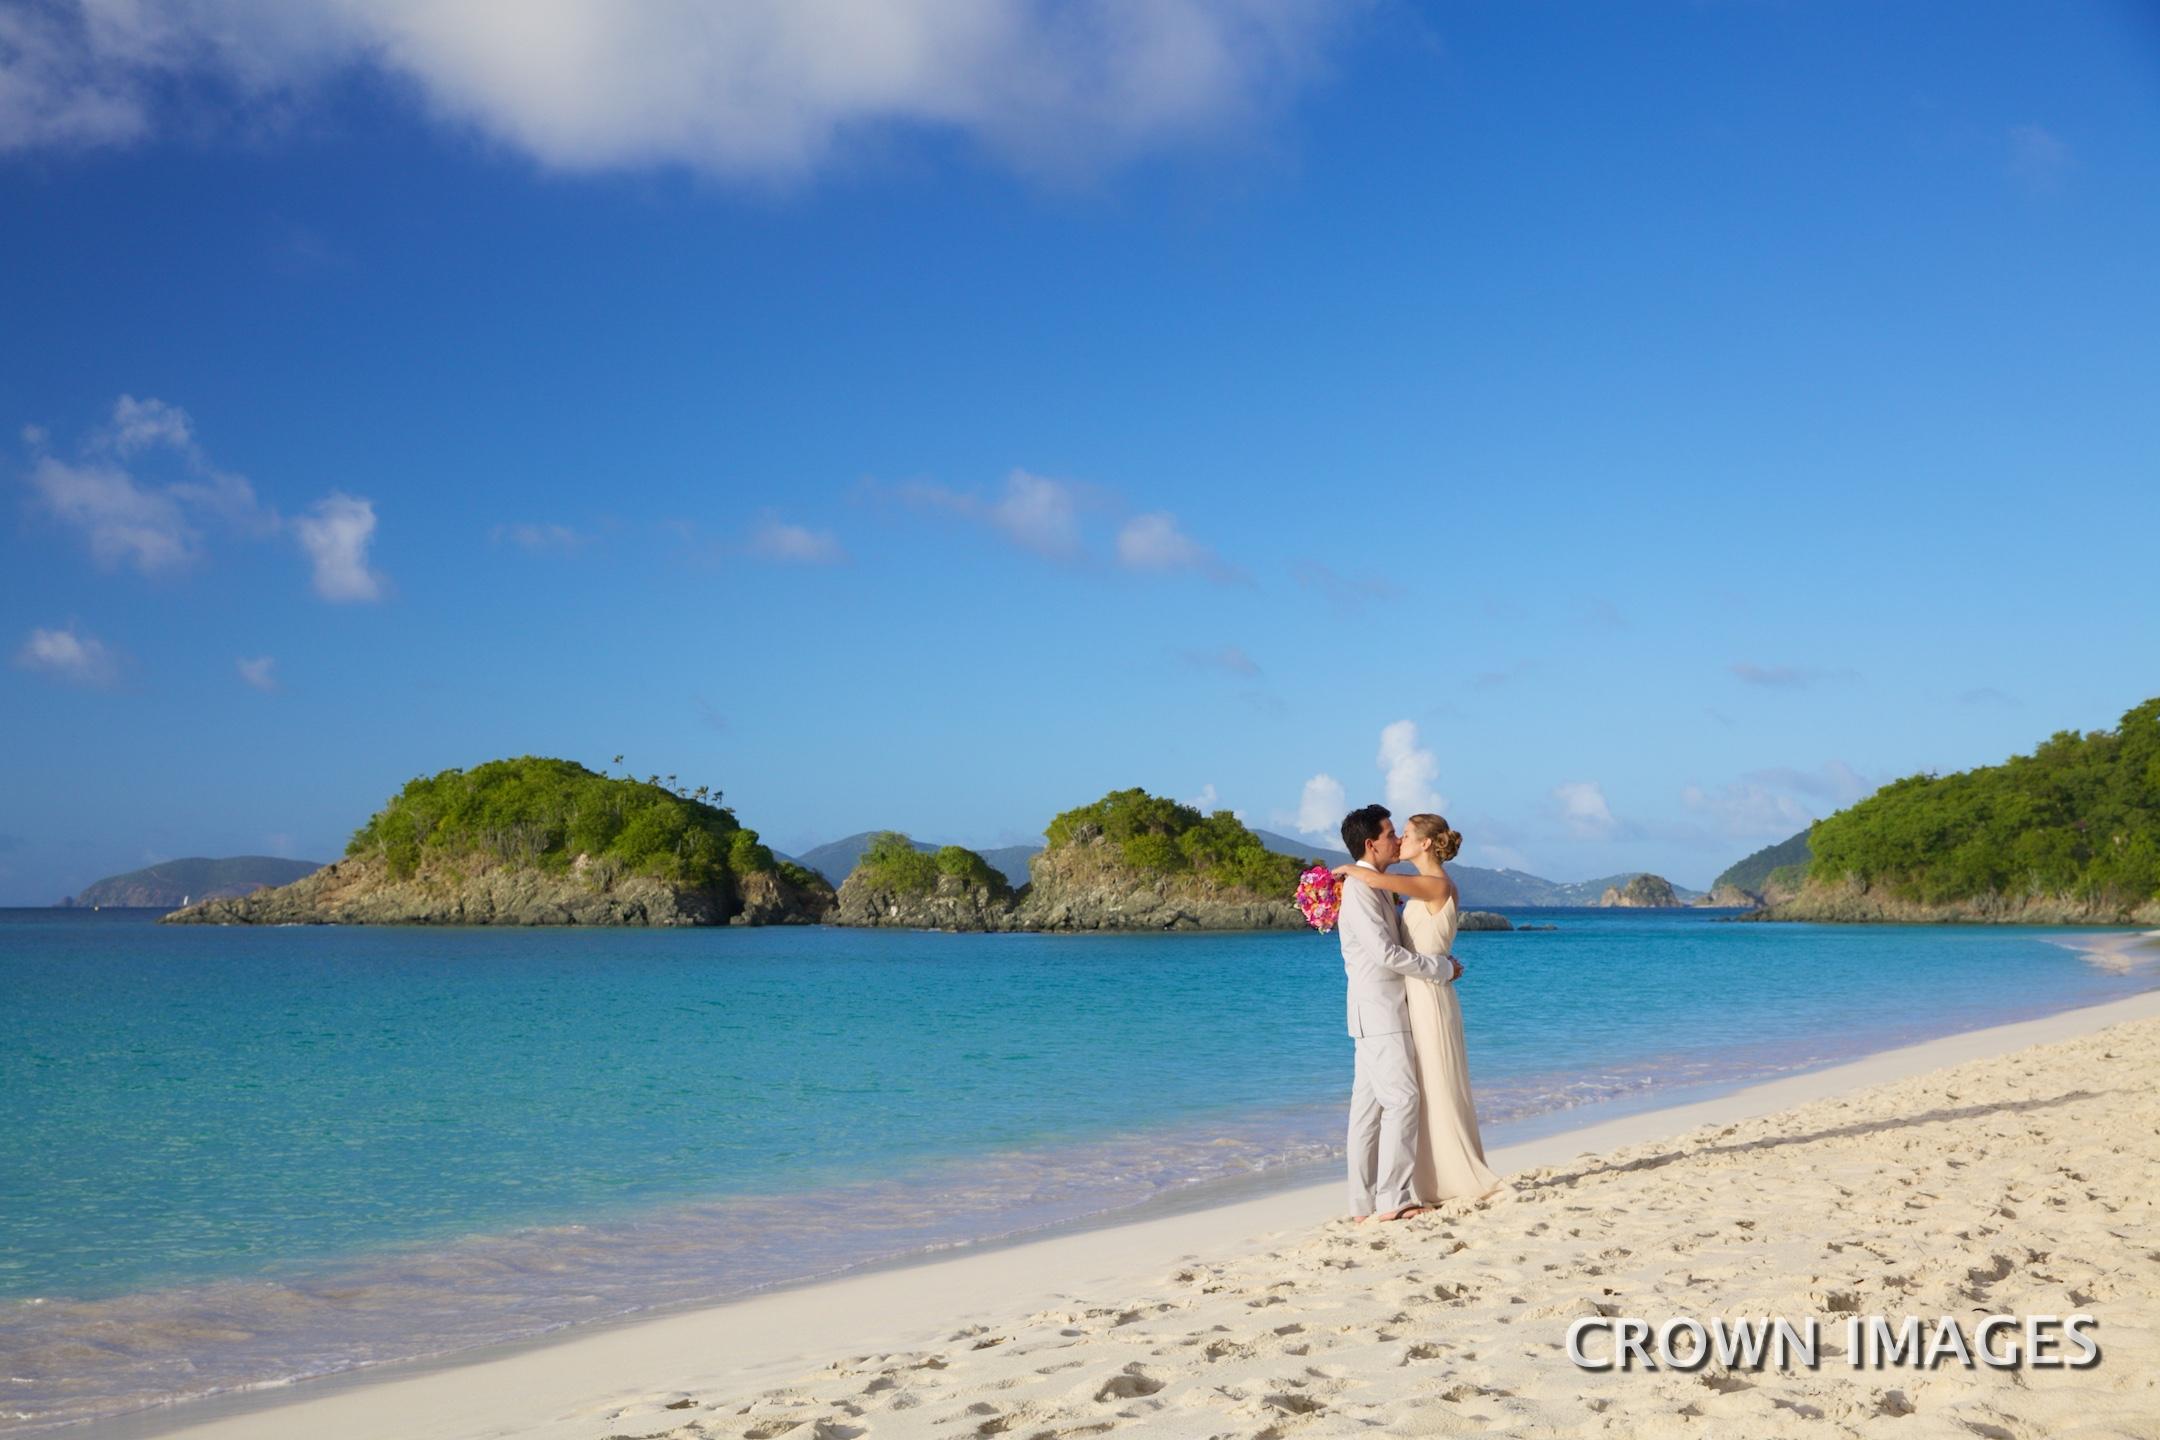 wedding locations for a beach wedding on st john